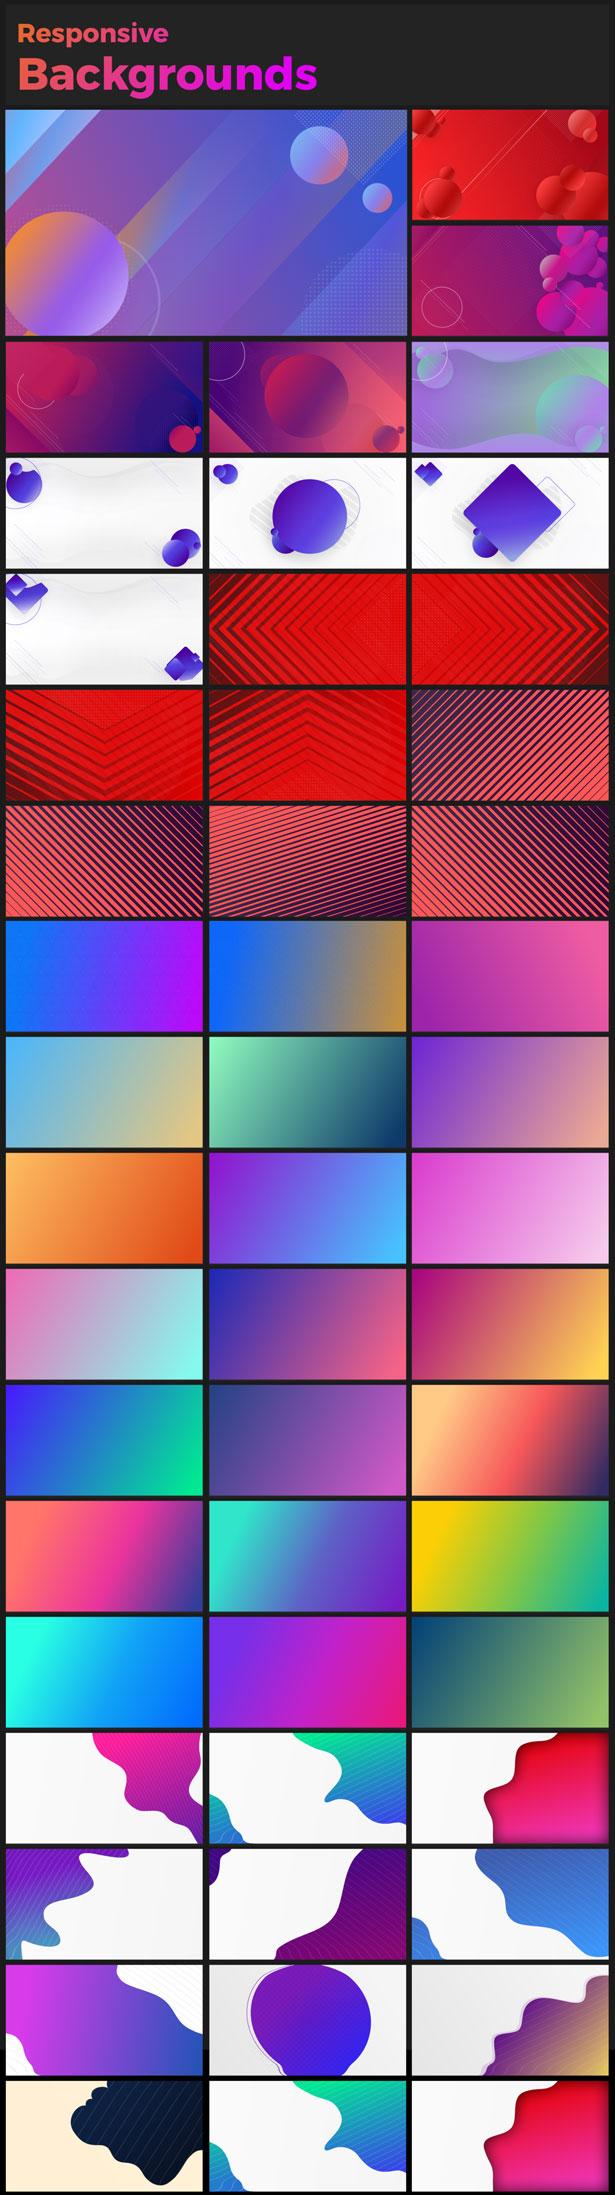 AE模板-860组文字标题排版图形转场气泡指示线背景动画元素V18